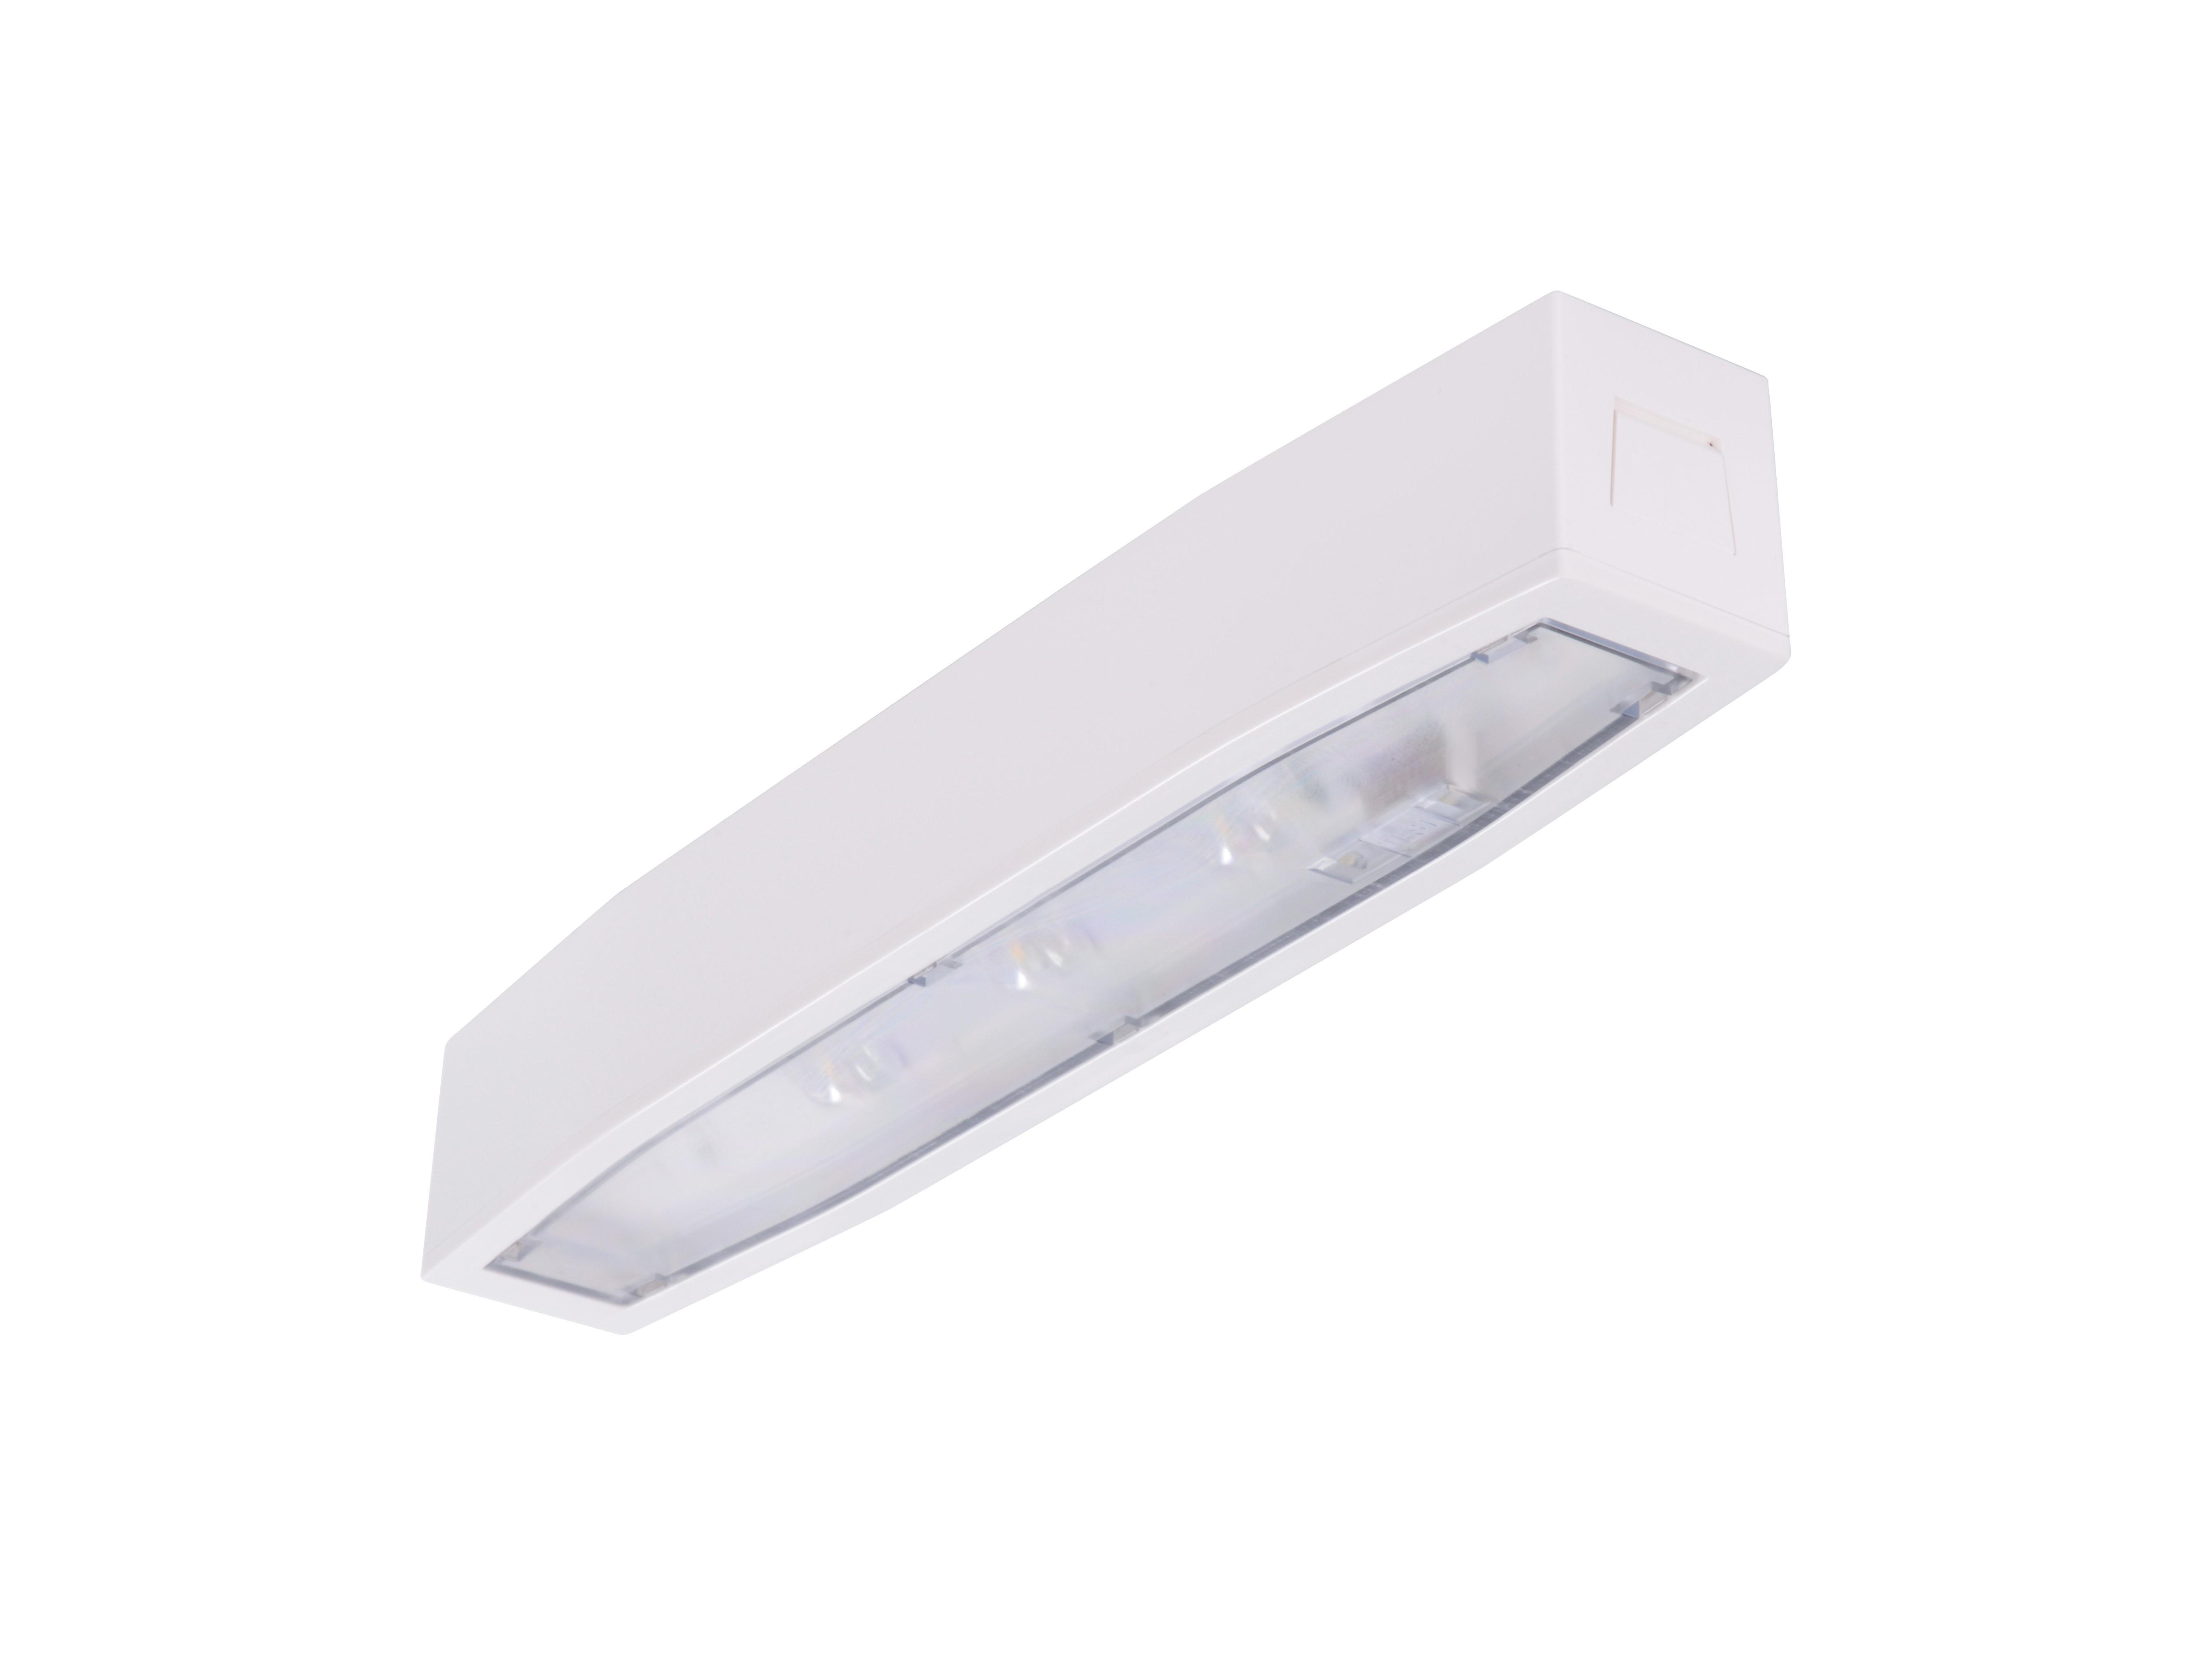 Lampa emergenta led Intelight 94719   3h nementinut test automat0